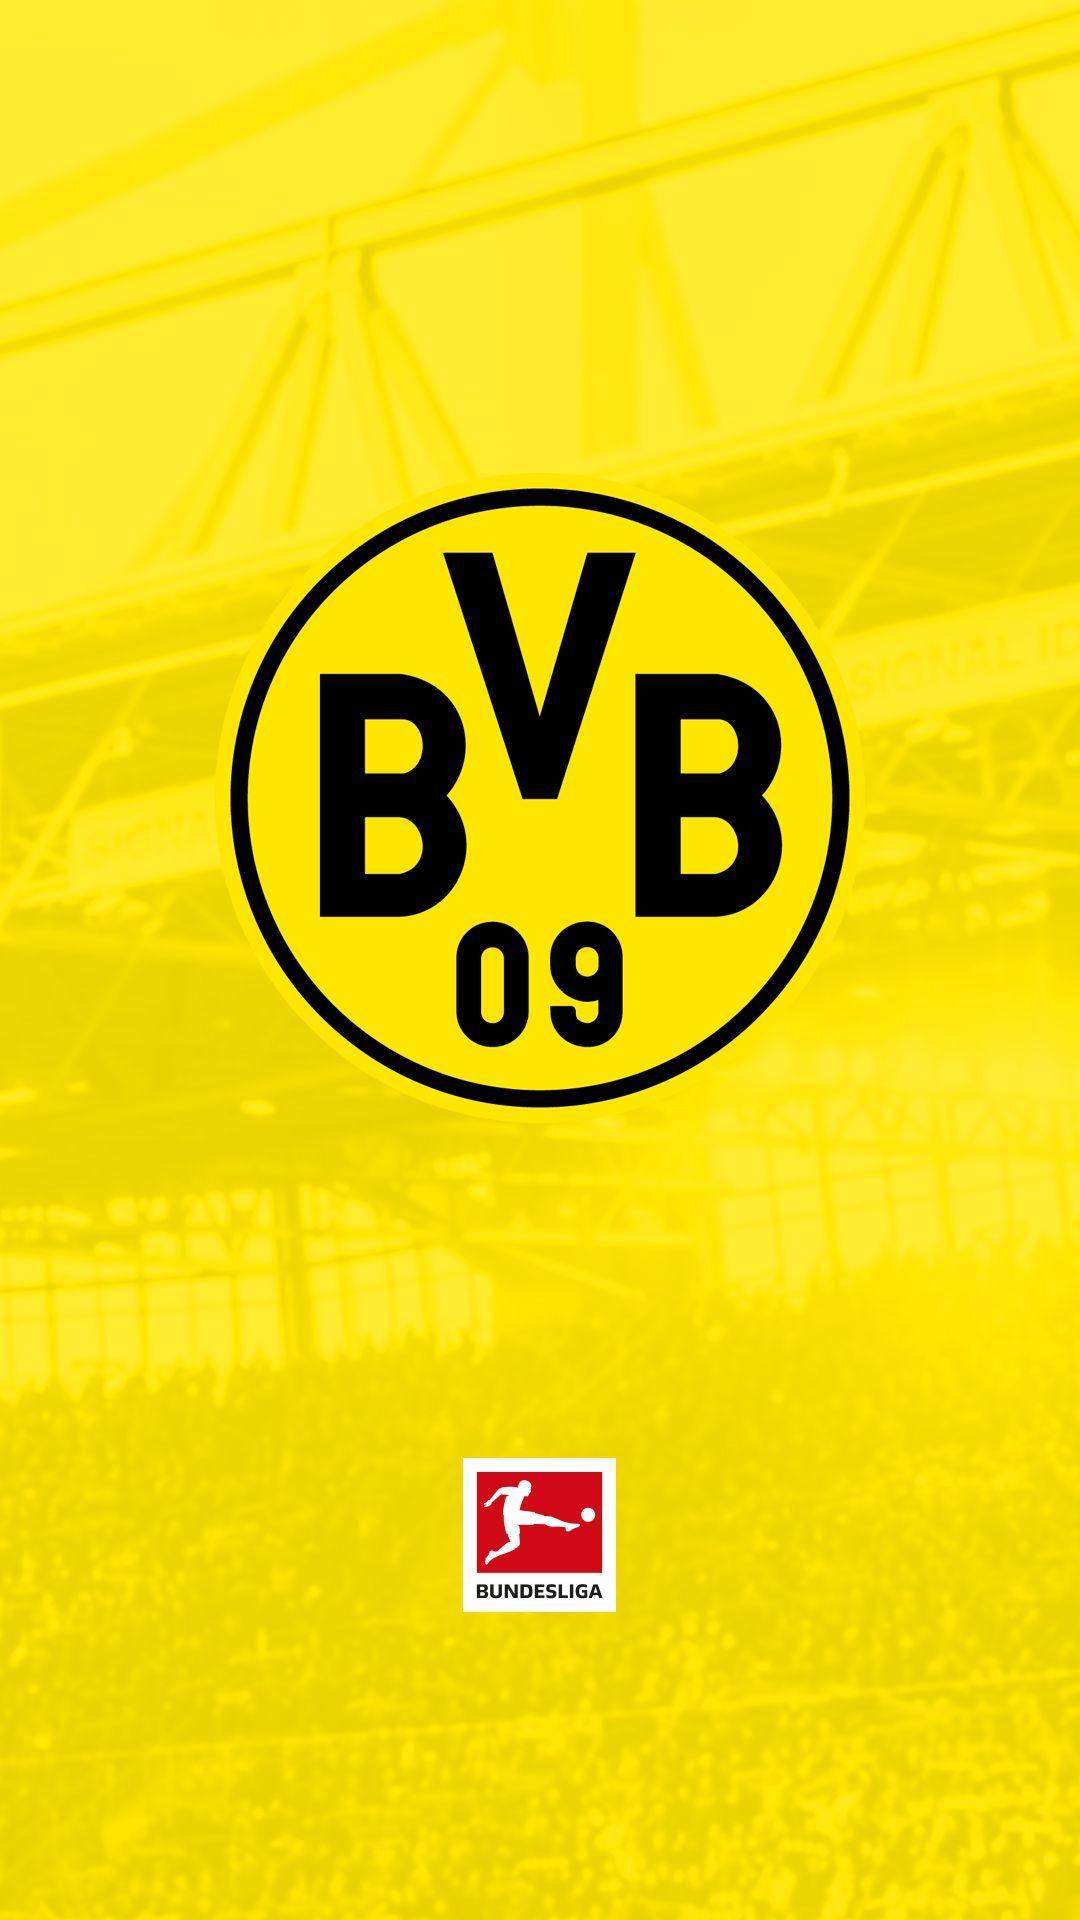 Bundesliga Download Your Free Bundesliga Club Wallpaper To Your Phone Team Wallpaper Football Wallpaper Borussia Dortmund Wallpaper